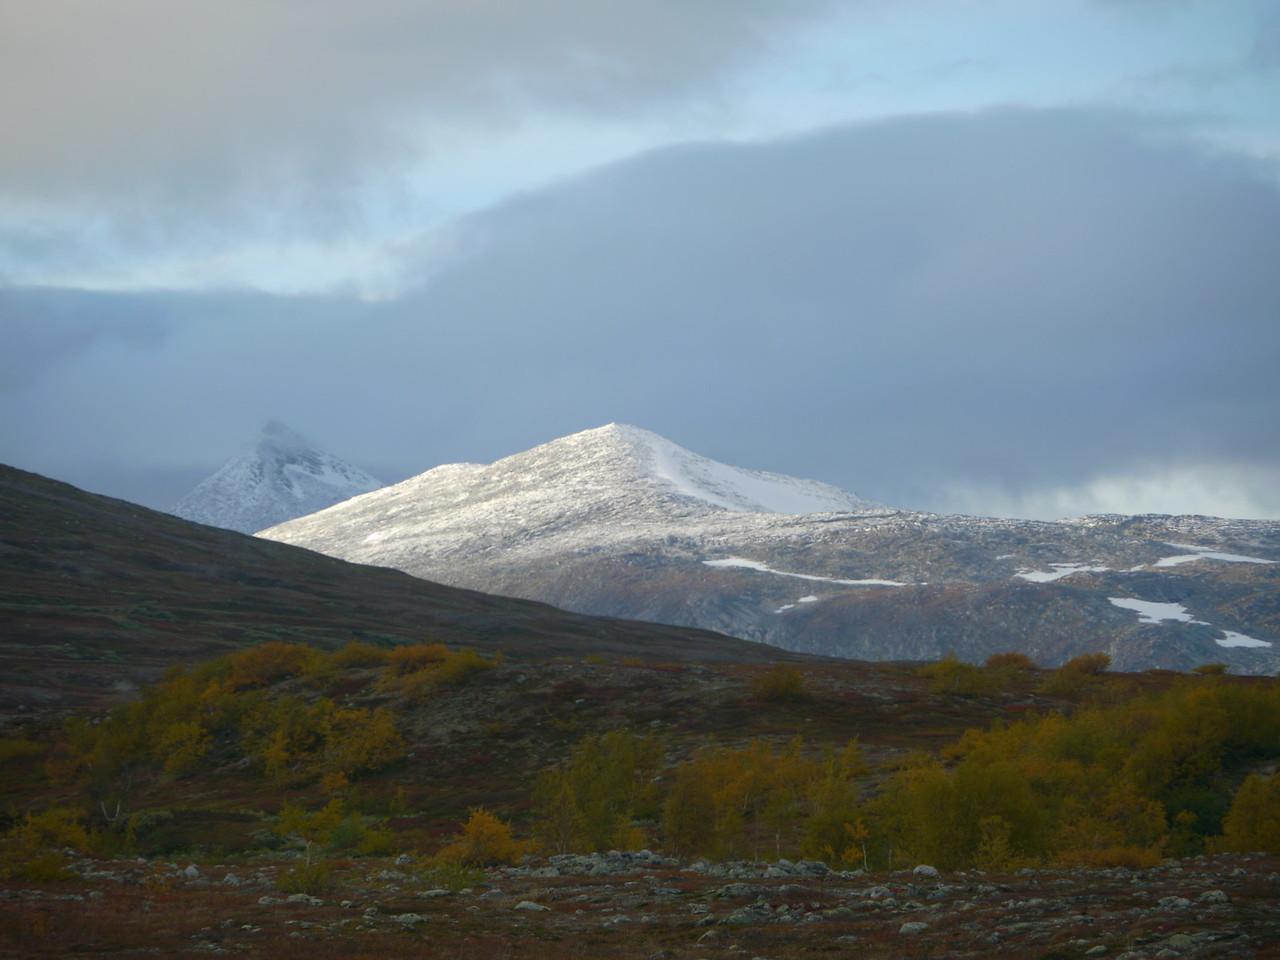 @RobAng 2012 / Junkerdal, , Nordland, NOR, Norwegen, 673 m ü/M, 18/09/2012 17:08:46